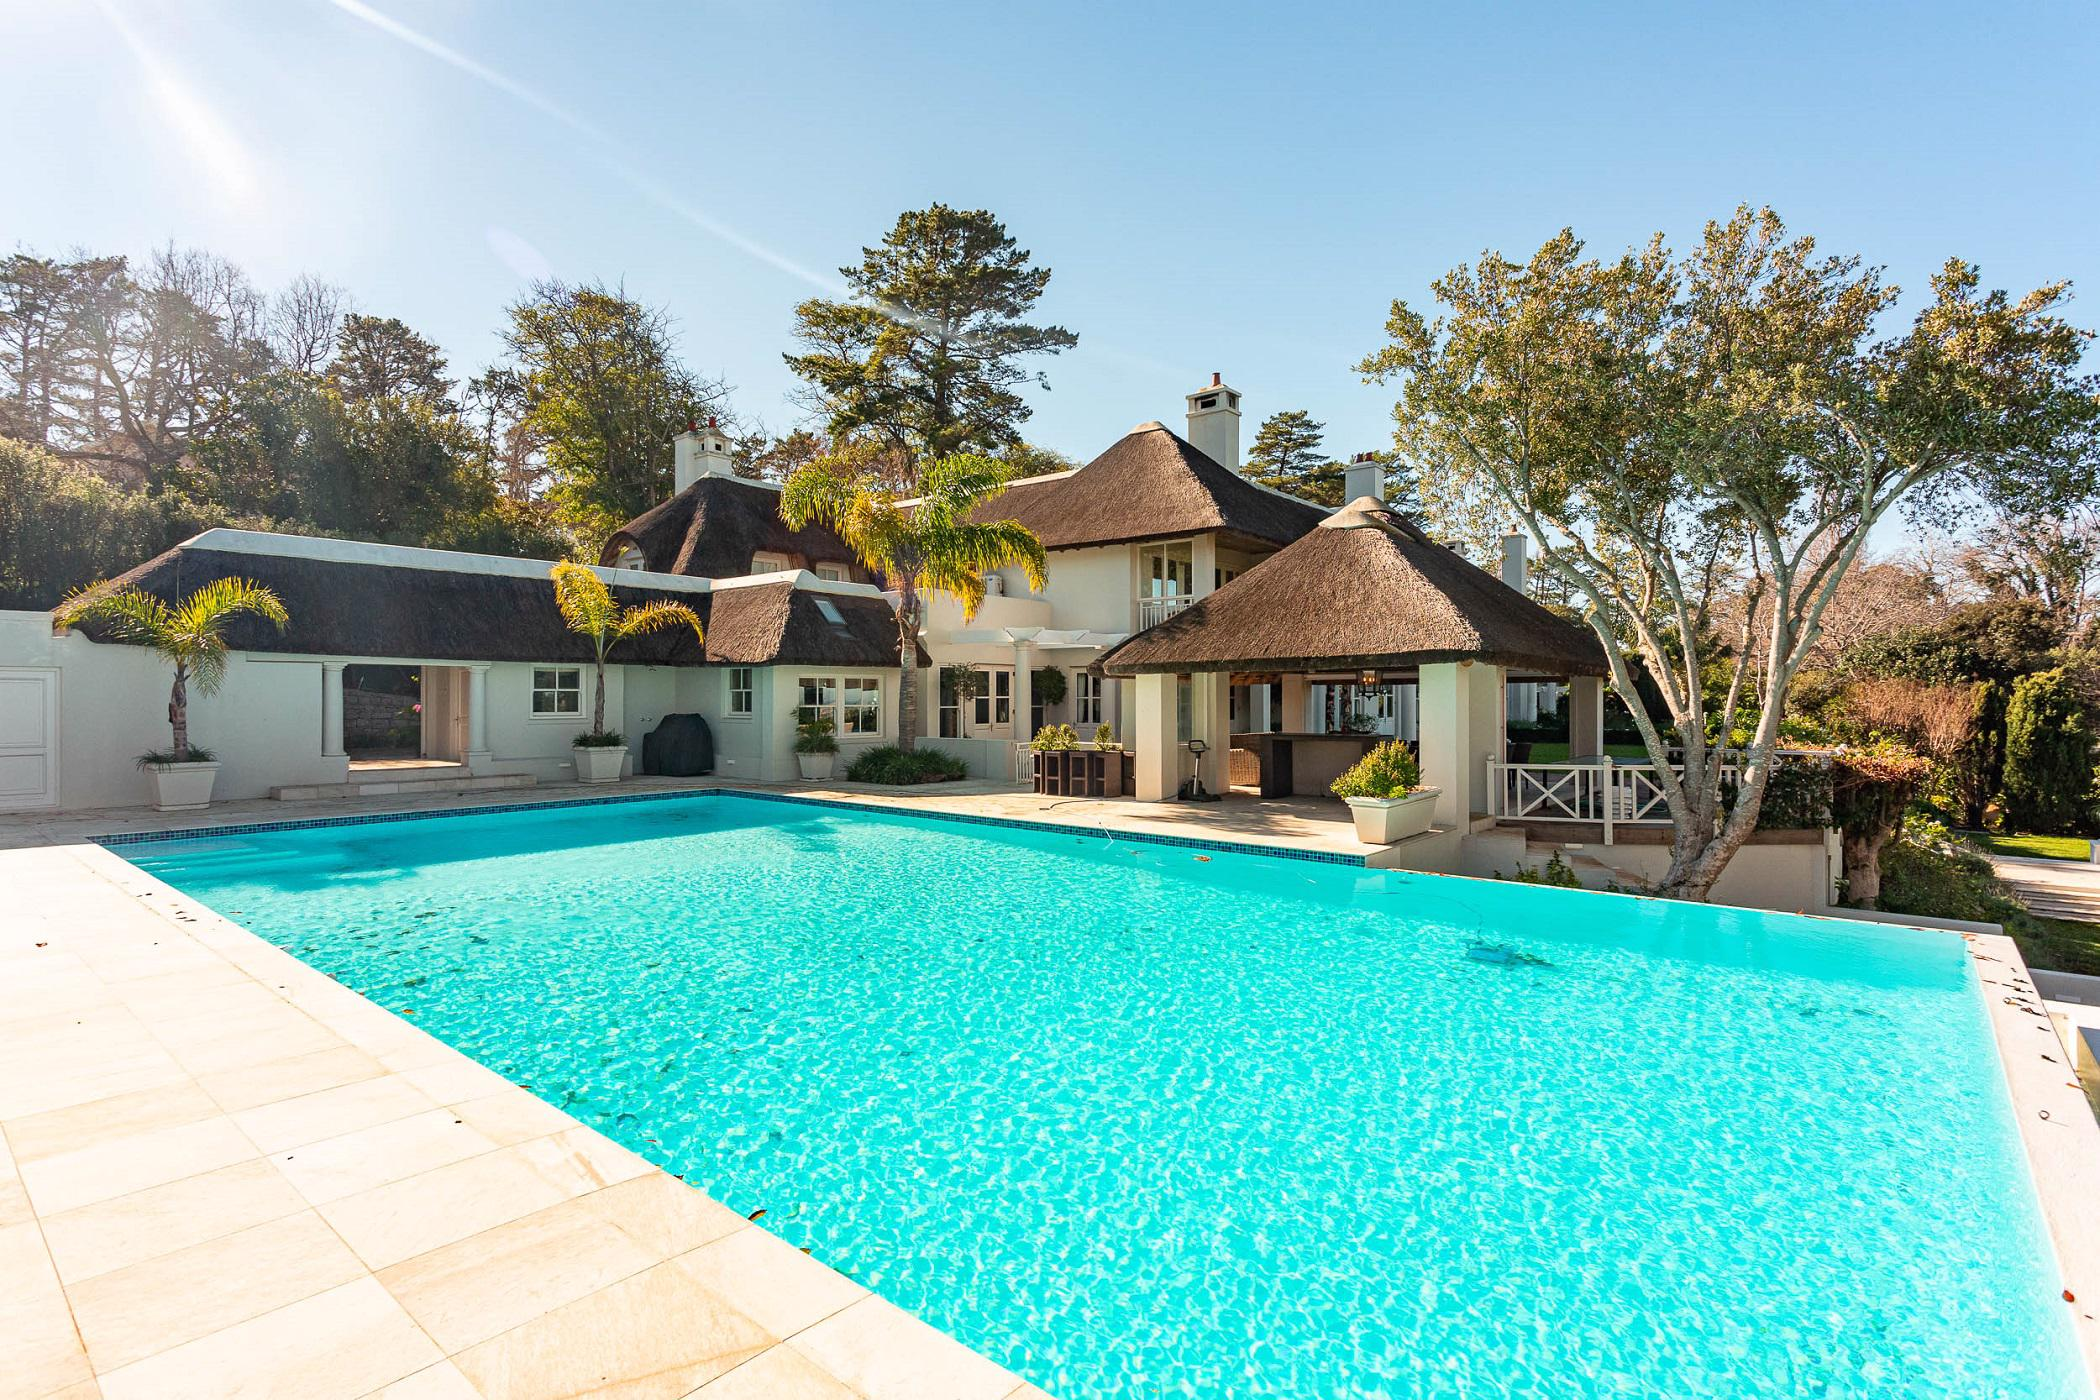 10 bedroom house to rent in Constantia (Cape Town)